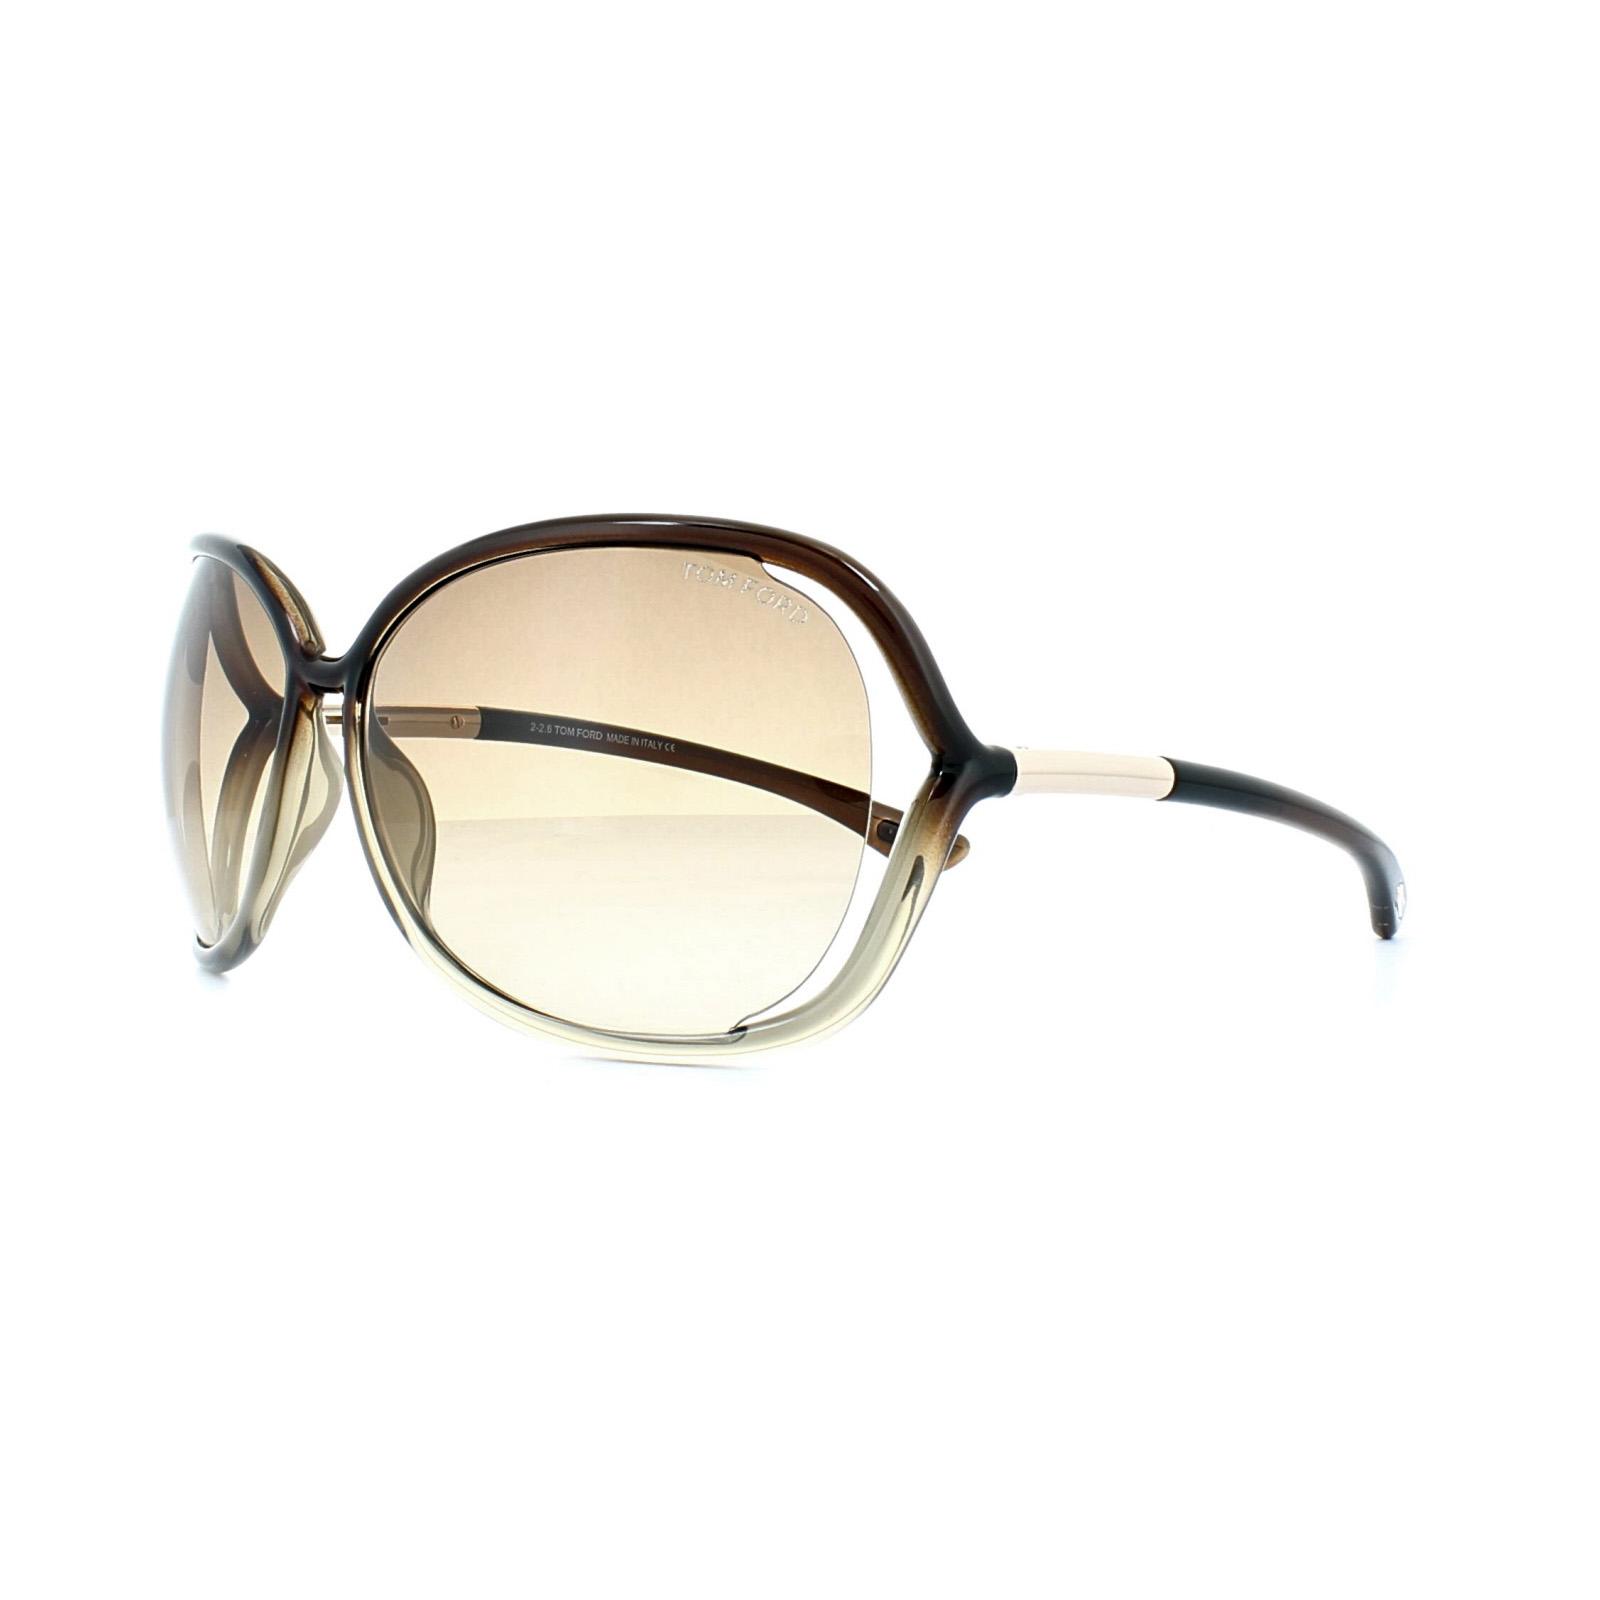 30d6370bb0ea Cheap Tom Ford 0076 Raquel Sunglasses - Discounted Sunglasses